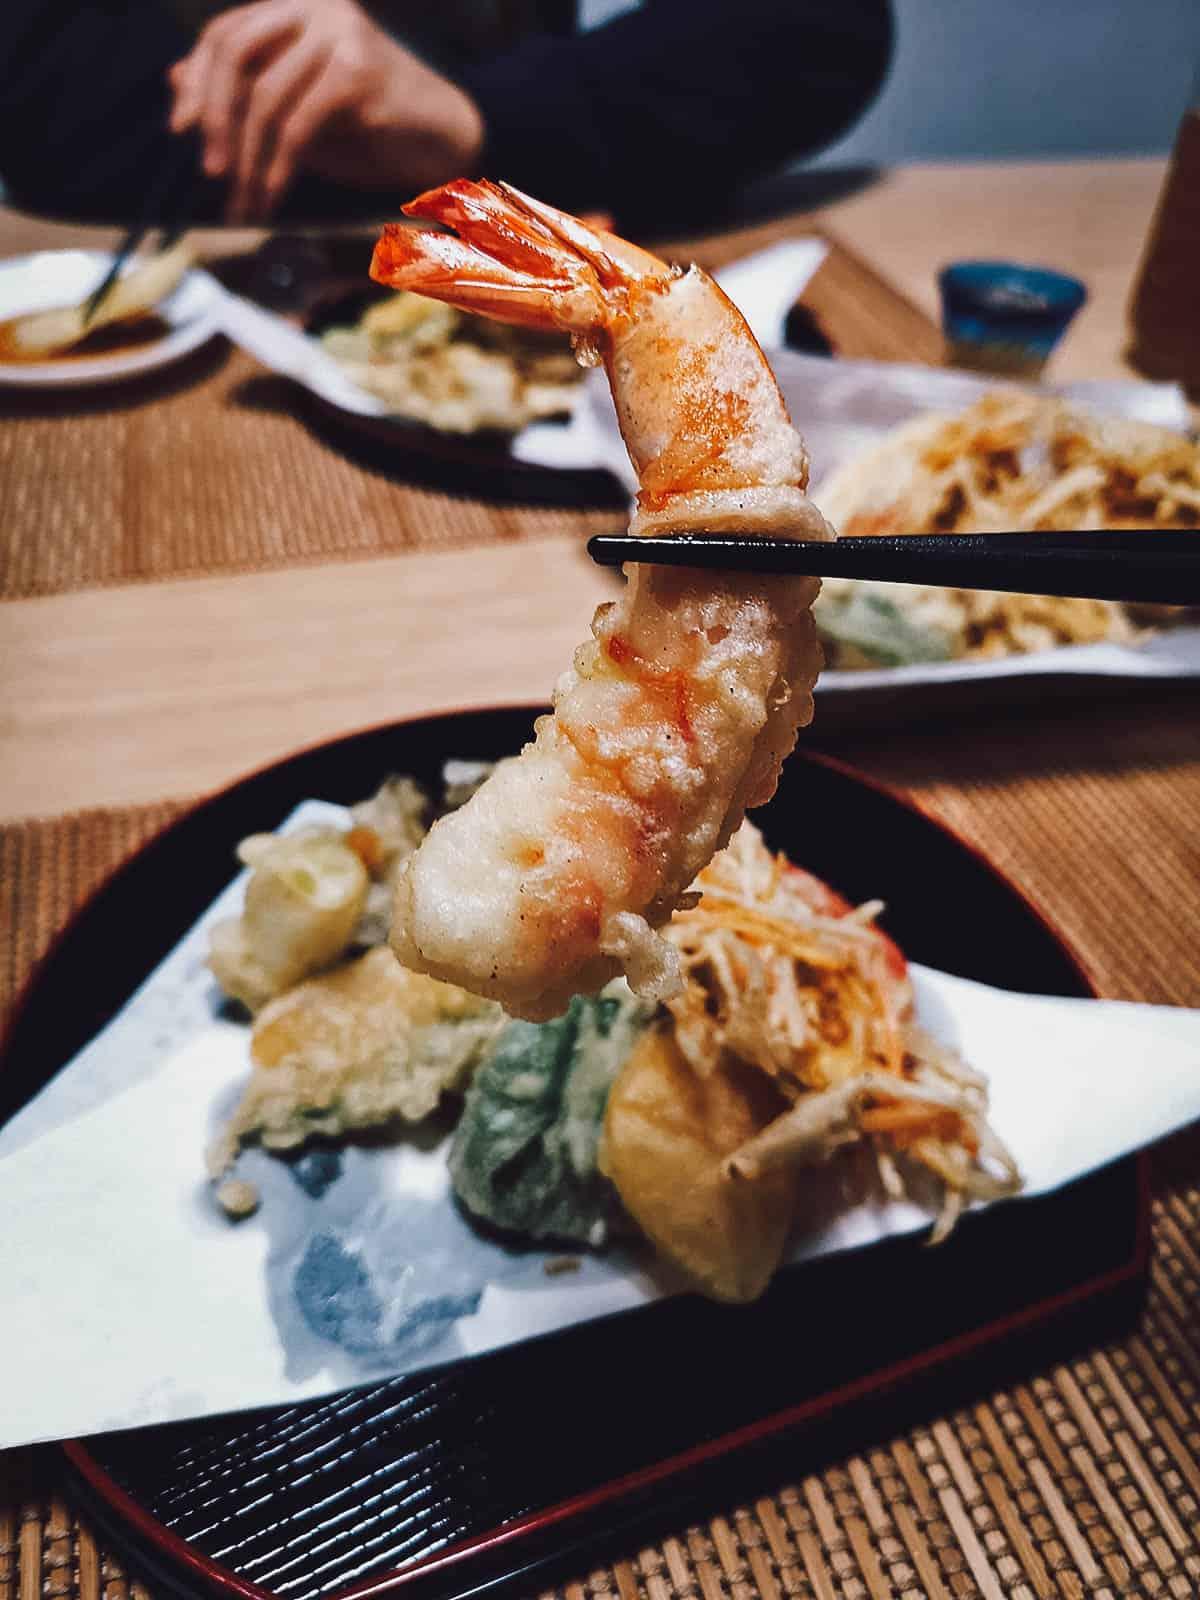 Making tempura